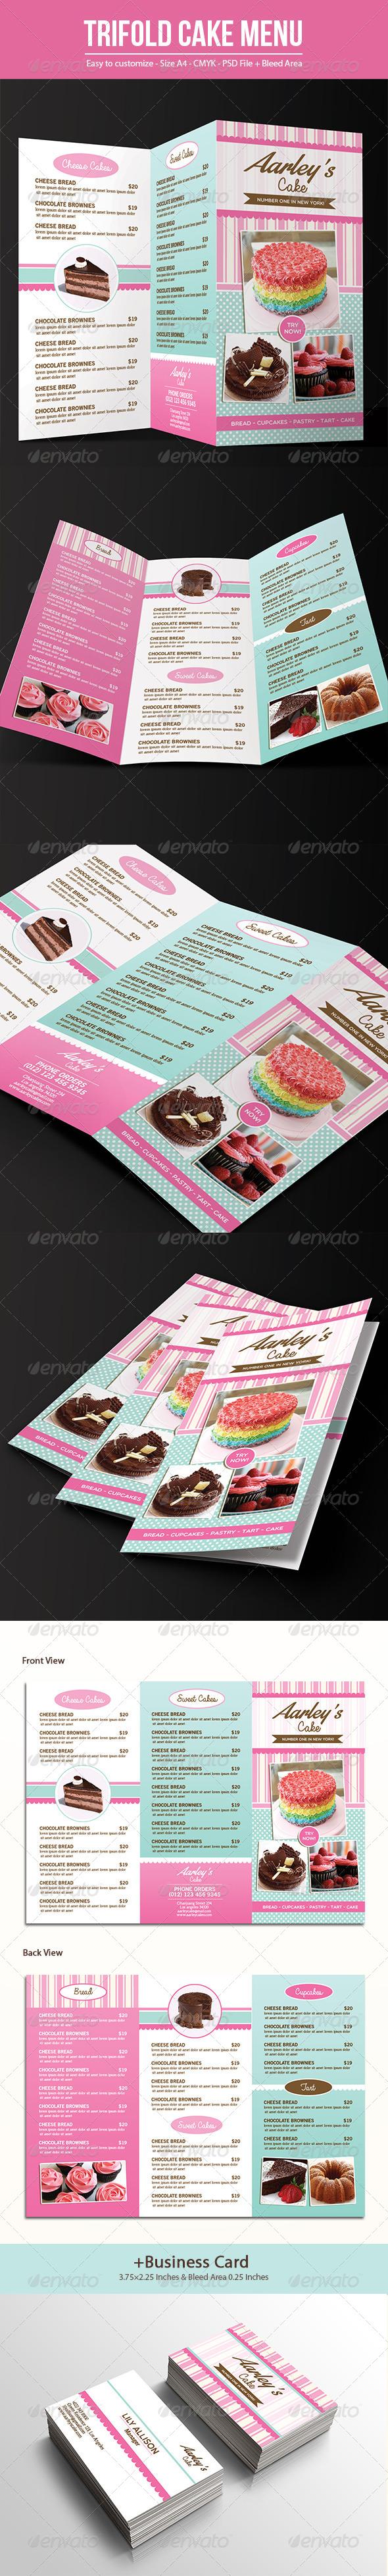 Trifold Cake Menu + Business Card